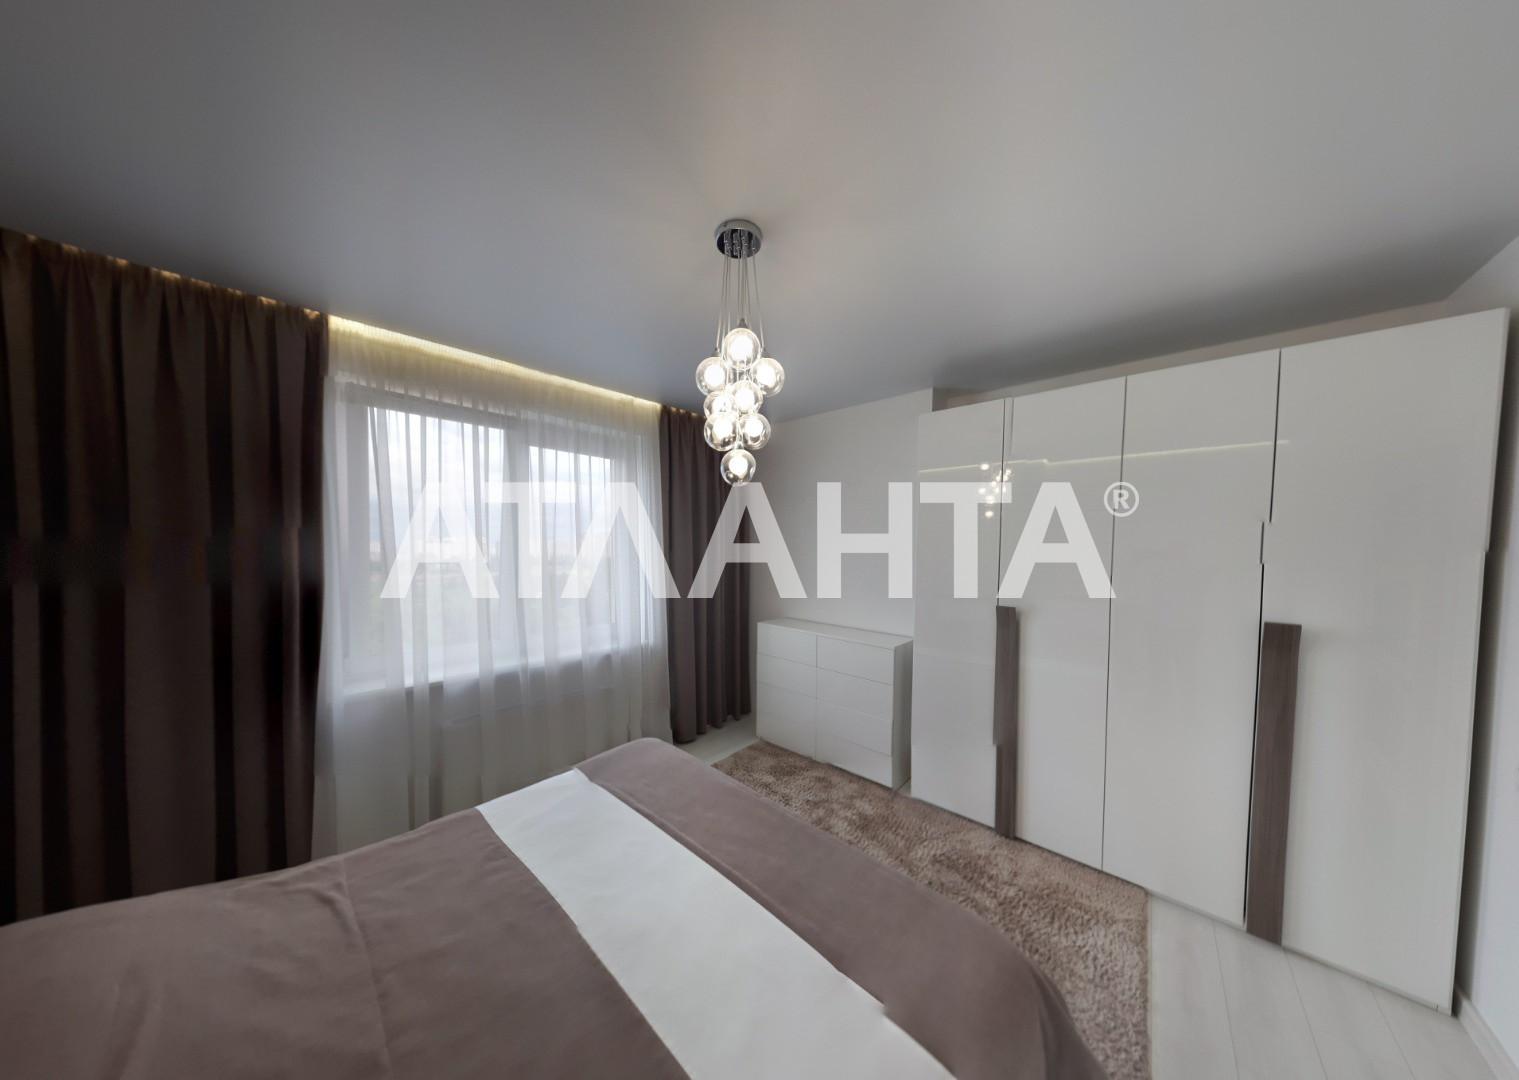 Продается 3-комнатная Квартира на ул. Просп. Глушкова — 160 000 у.е. (фото №20)